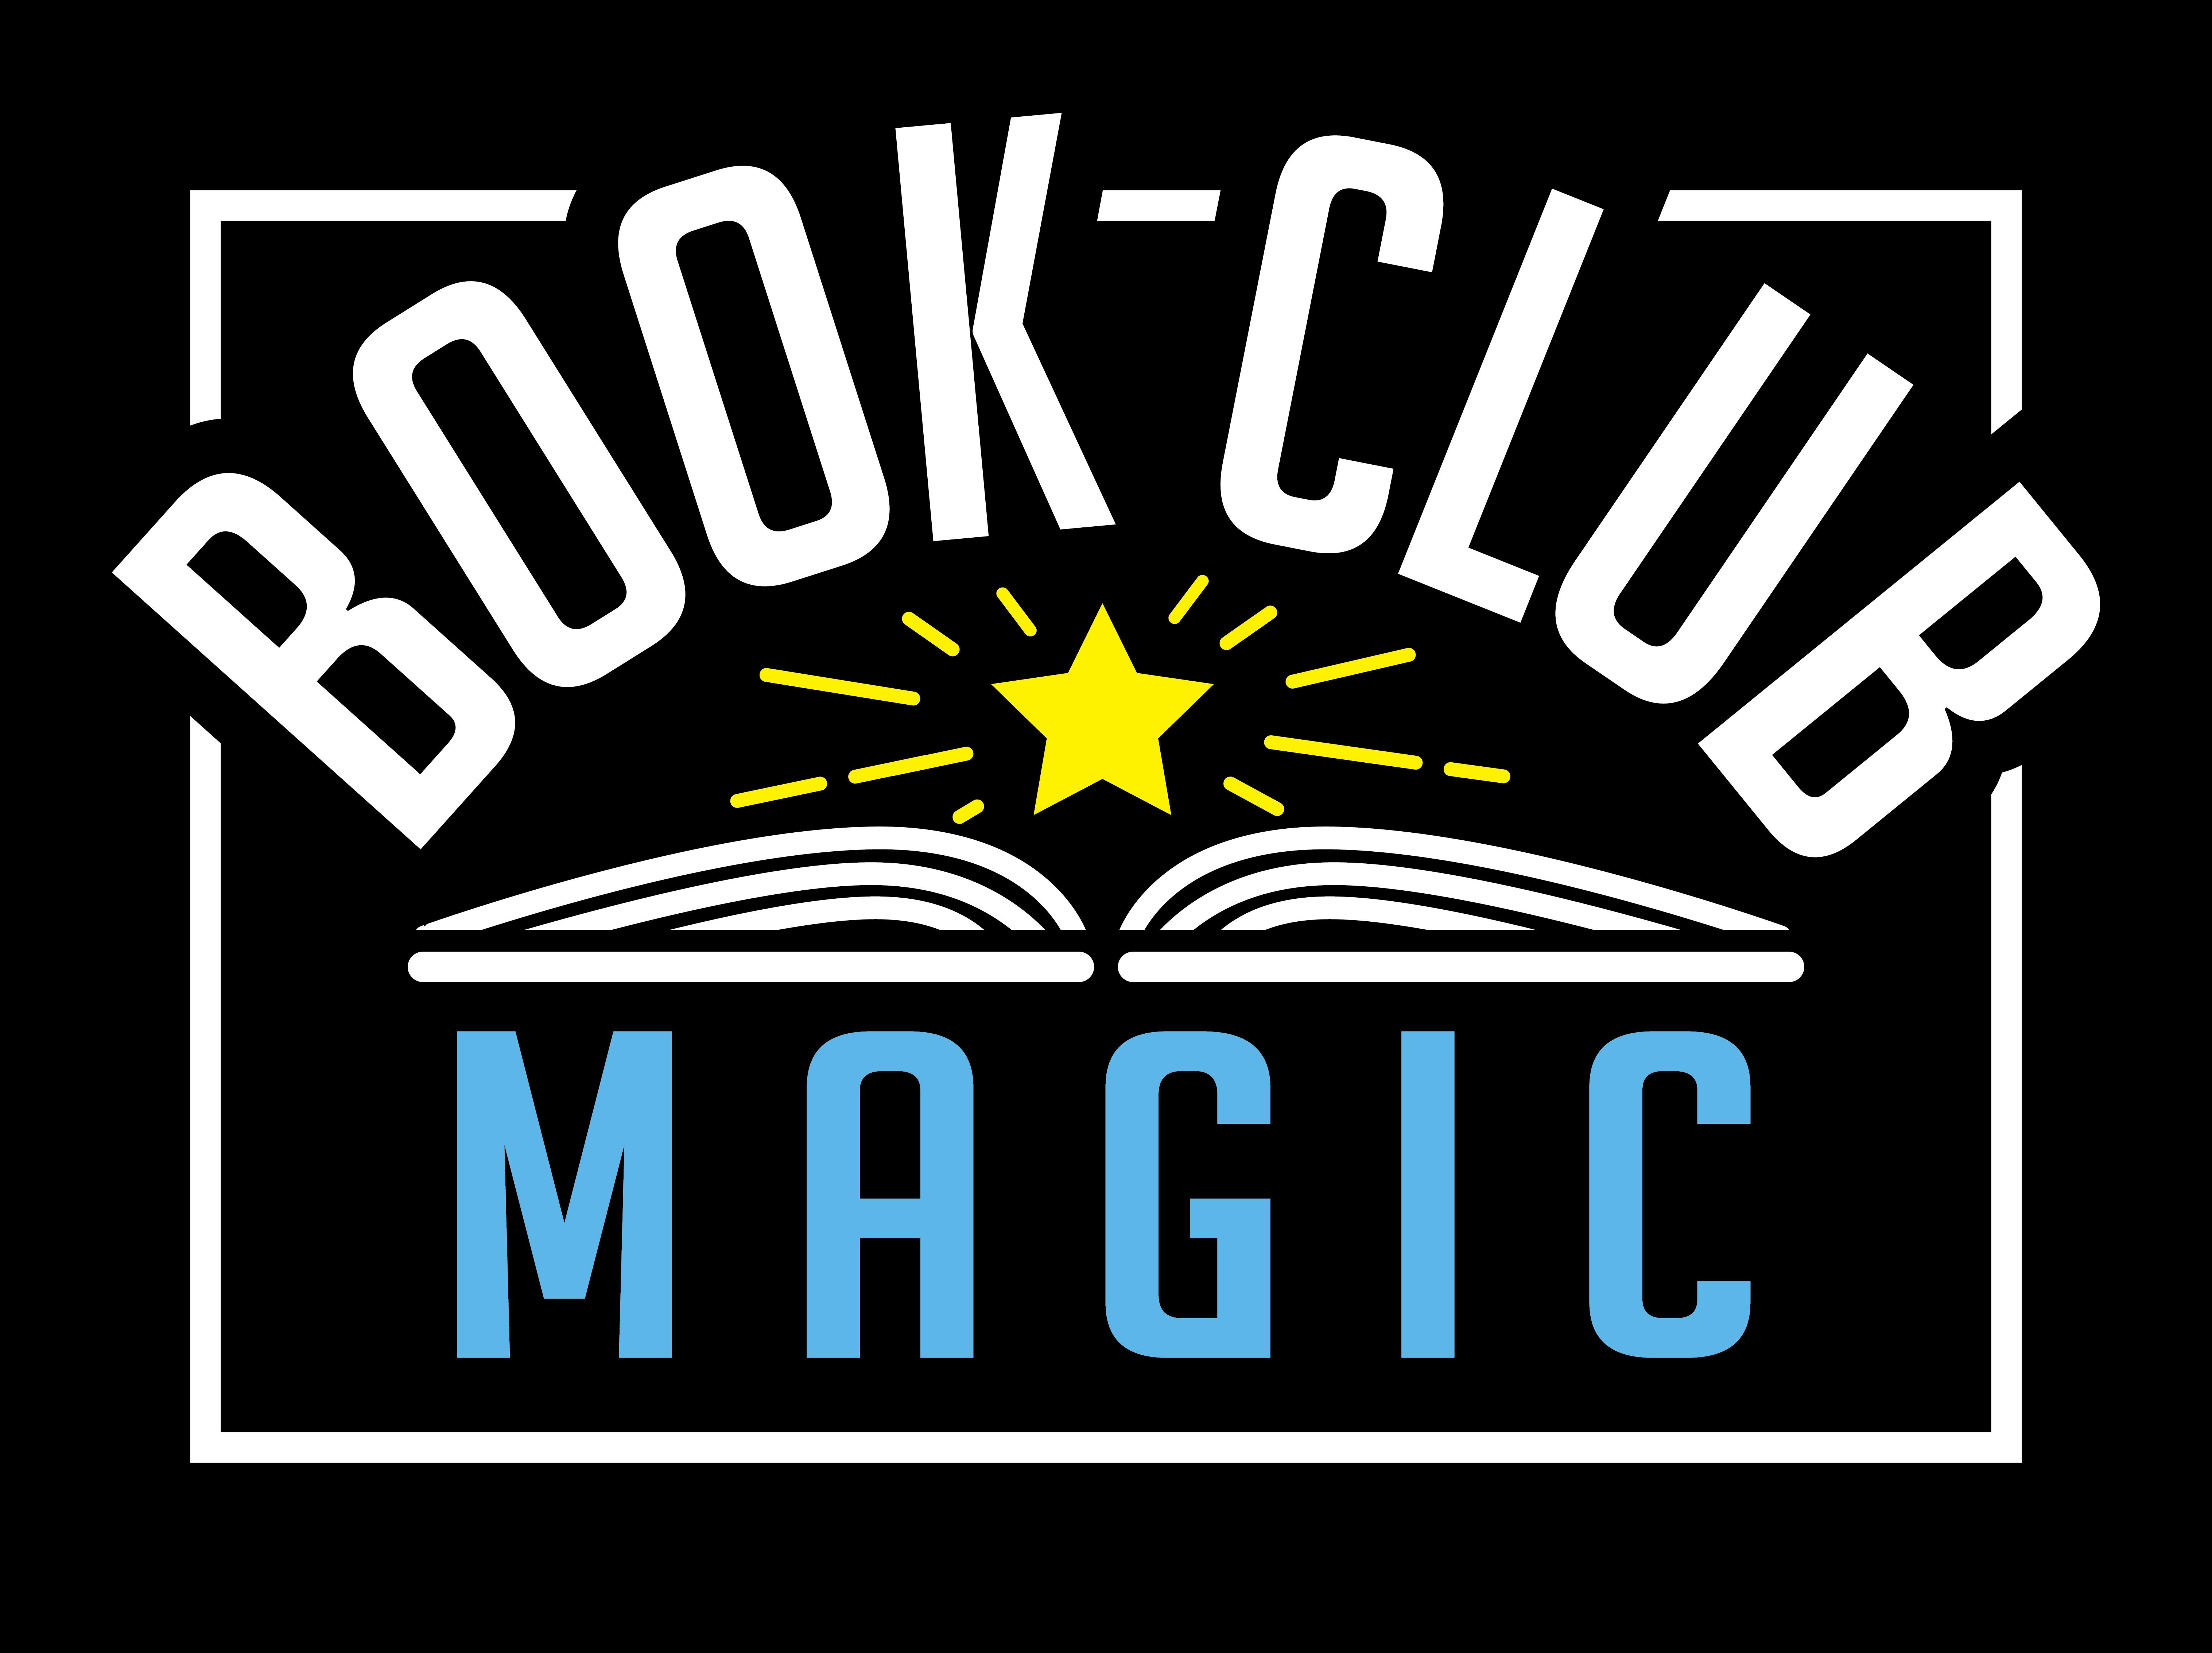 bookclubmagic.com